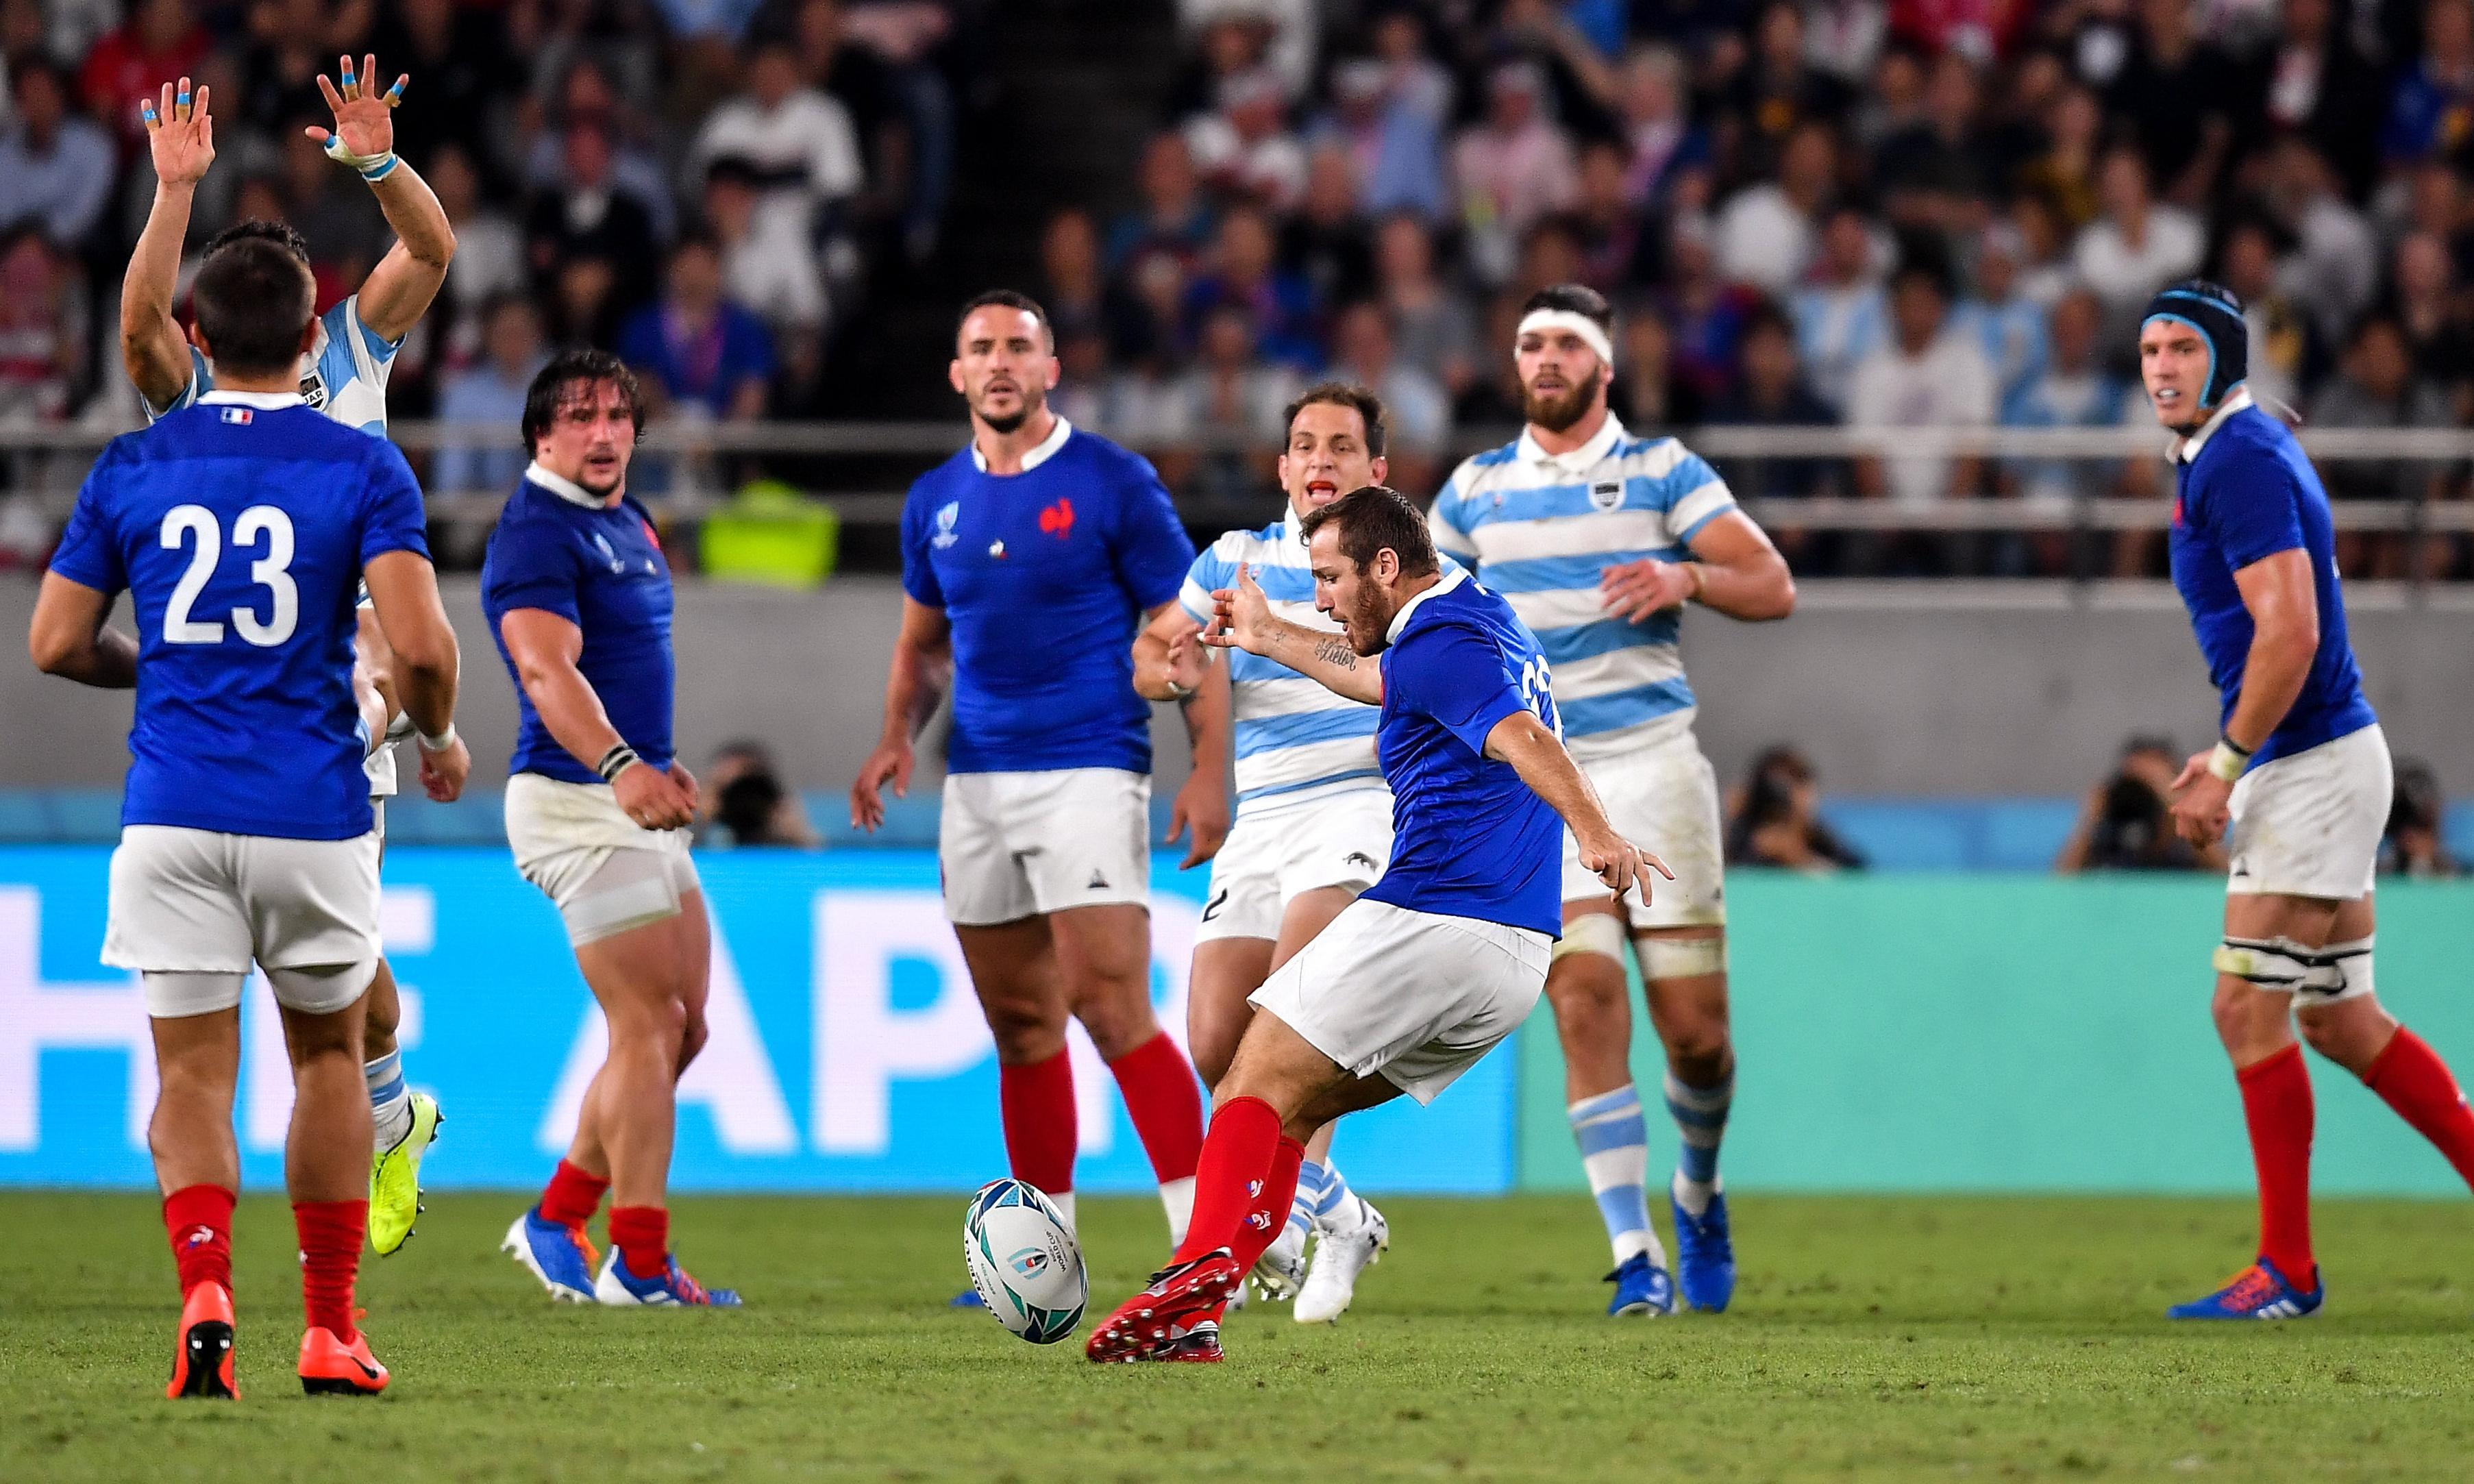 Argentina heartbreak after Camille Lopez's drop goal rescues France